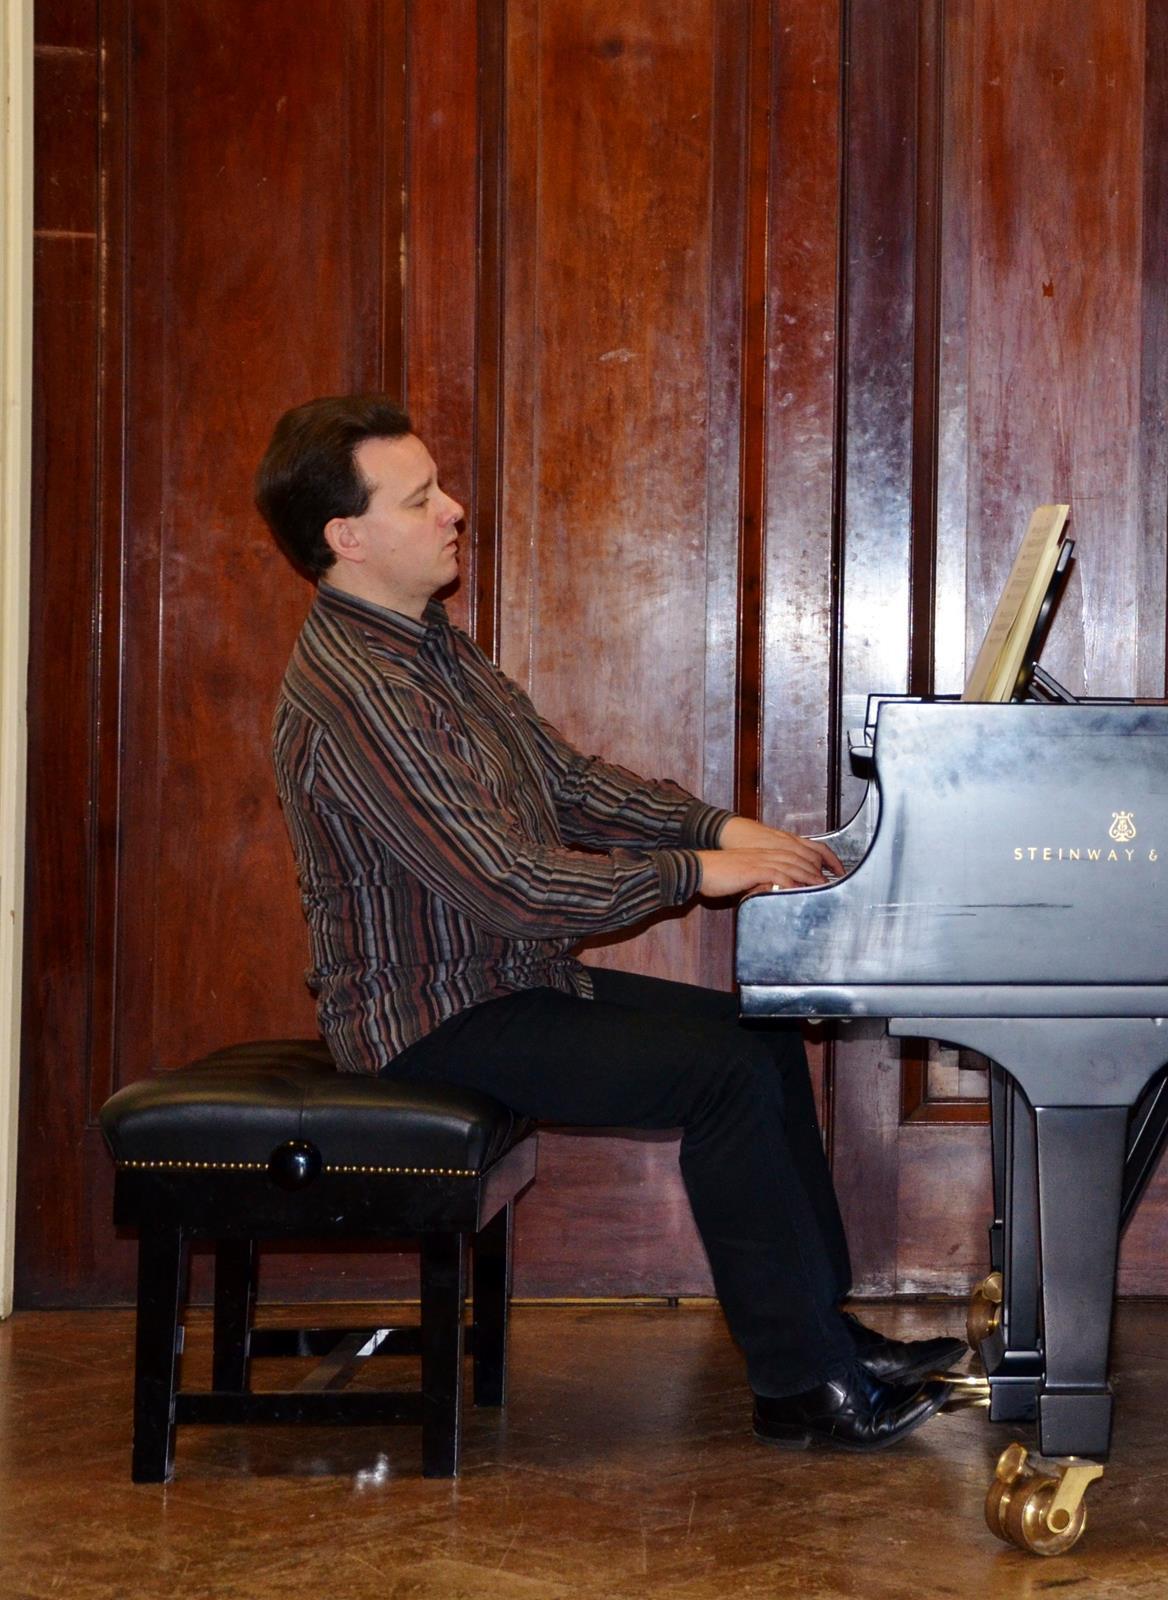 Michel Stas